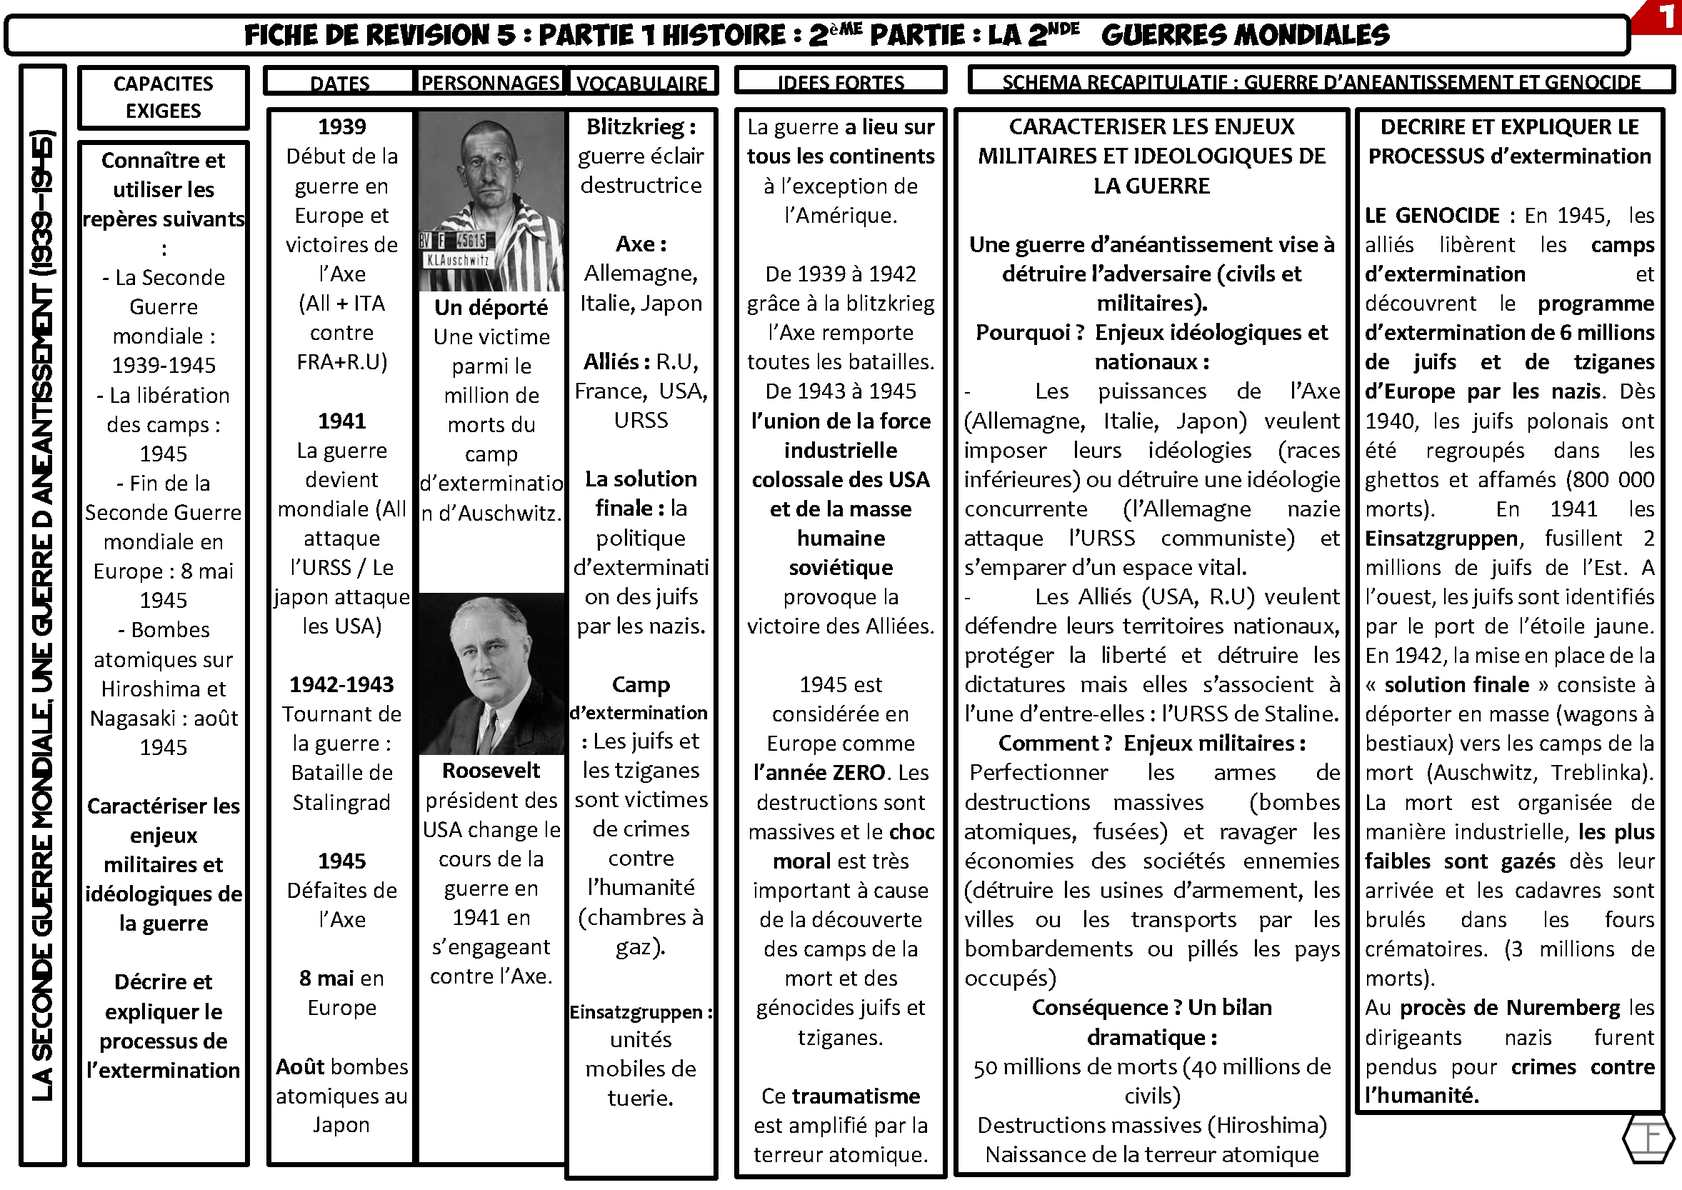 PDF FICHE REVISION 6 HISTOIRE 3EME 2E GUERRE MONDIALE  2014